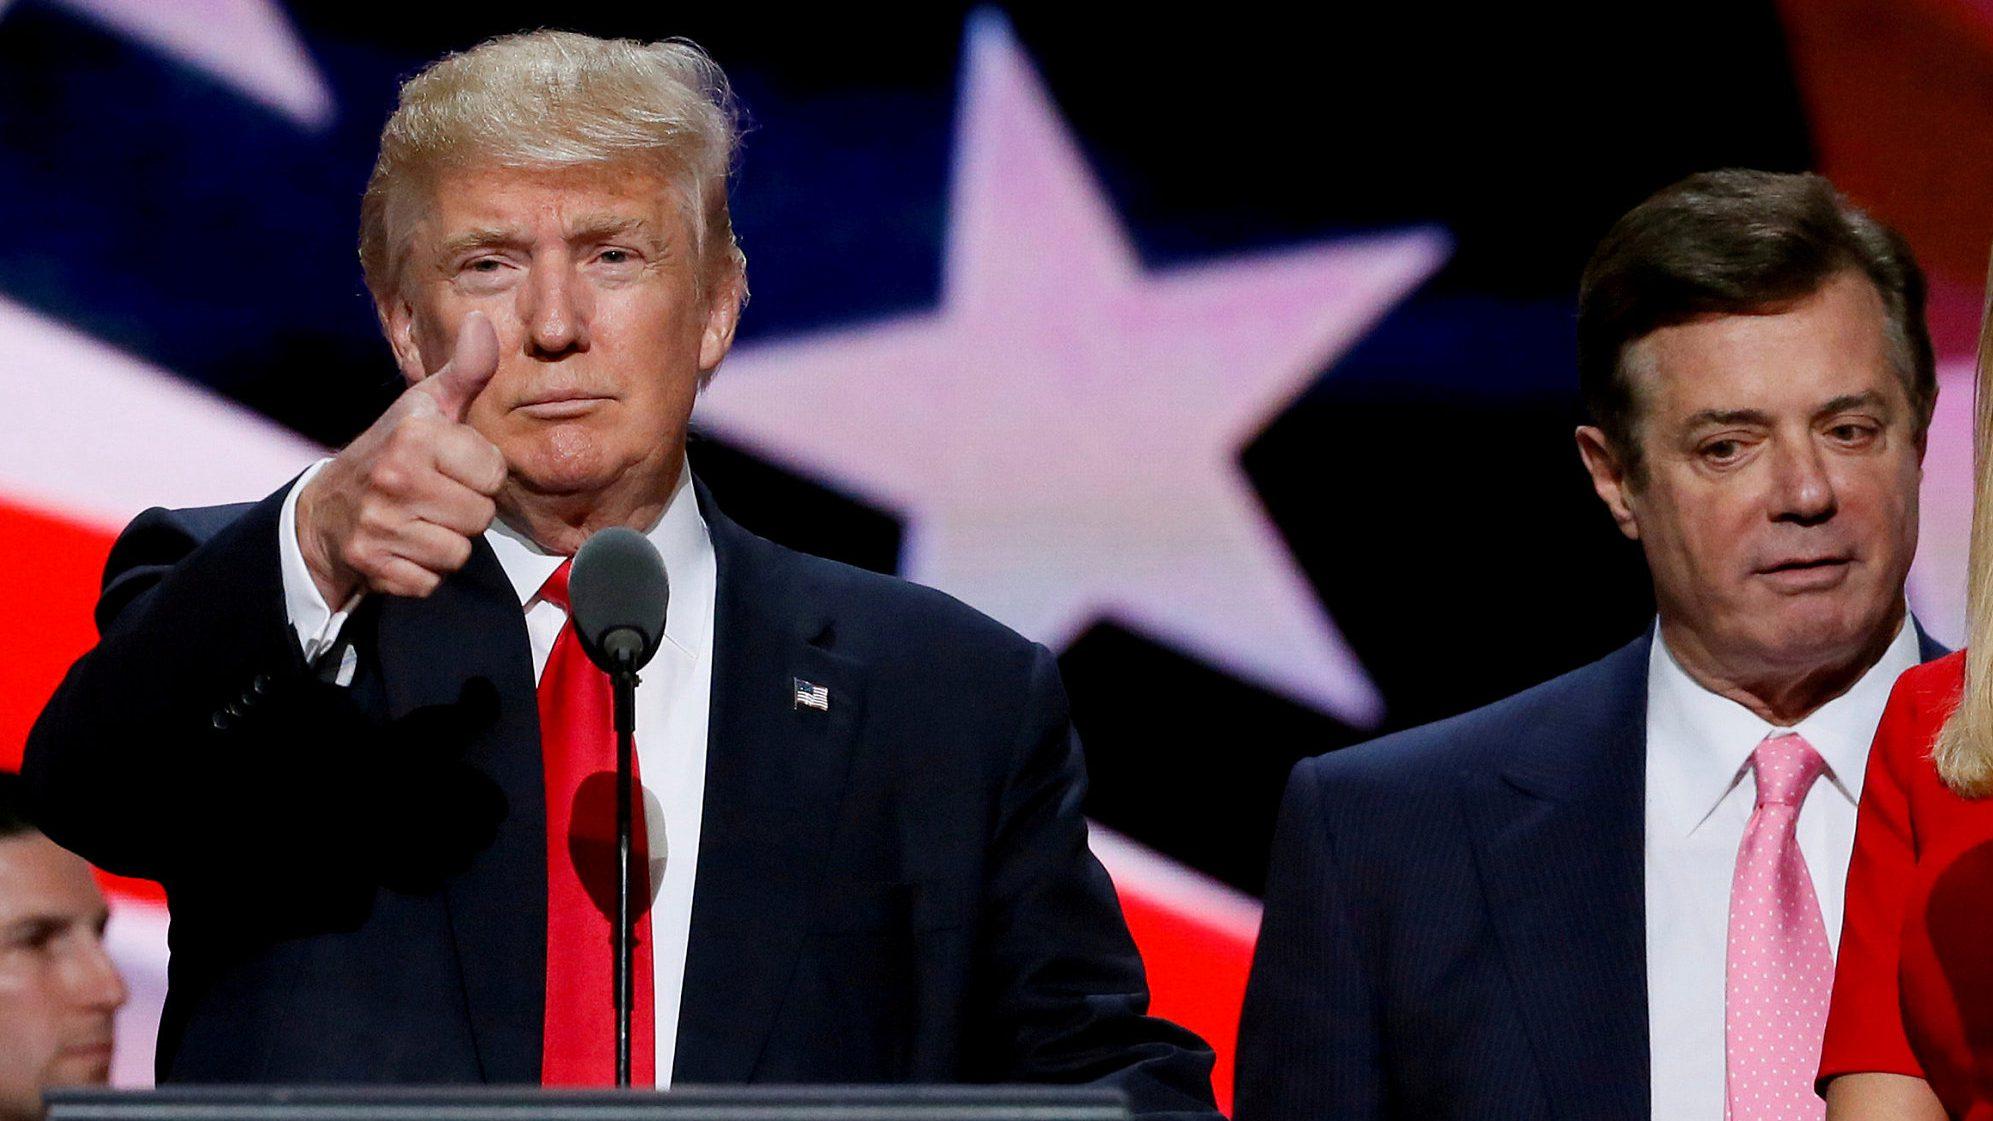 What does Michael Cohen's guilty plea mean for Trump